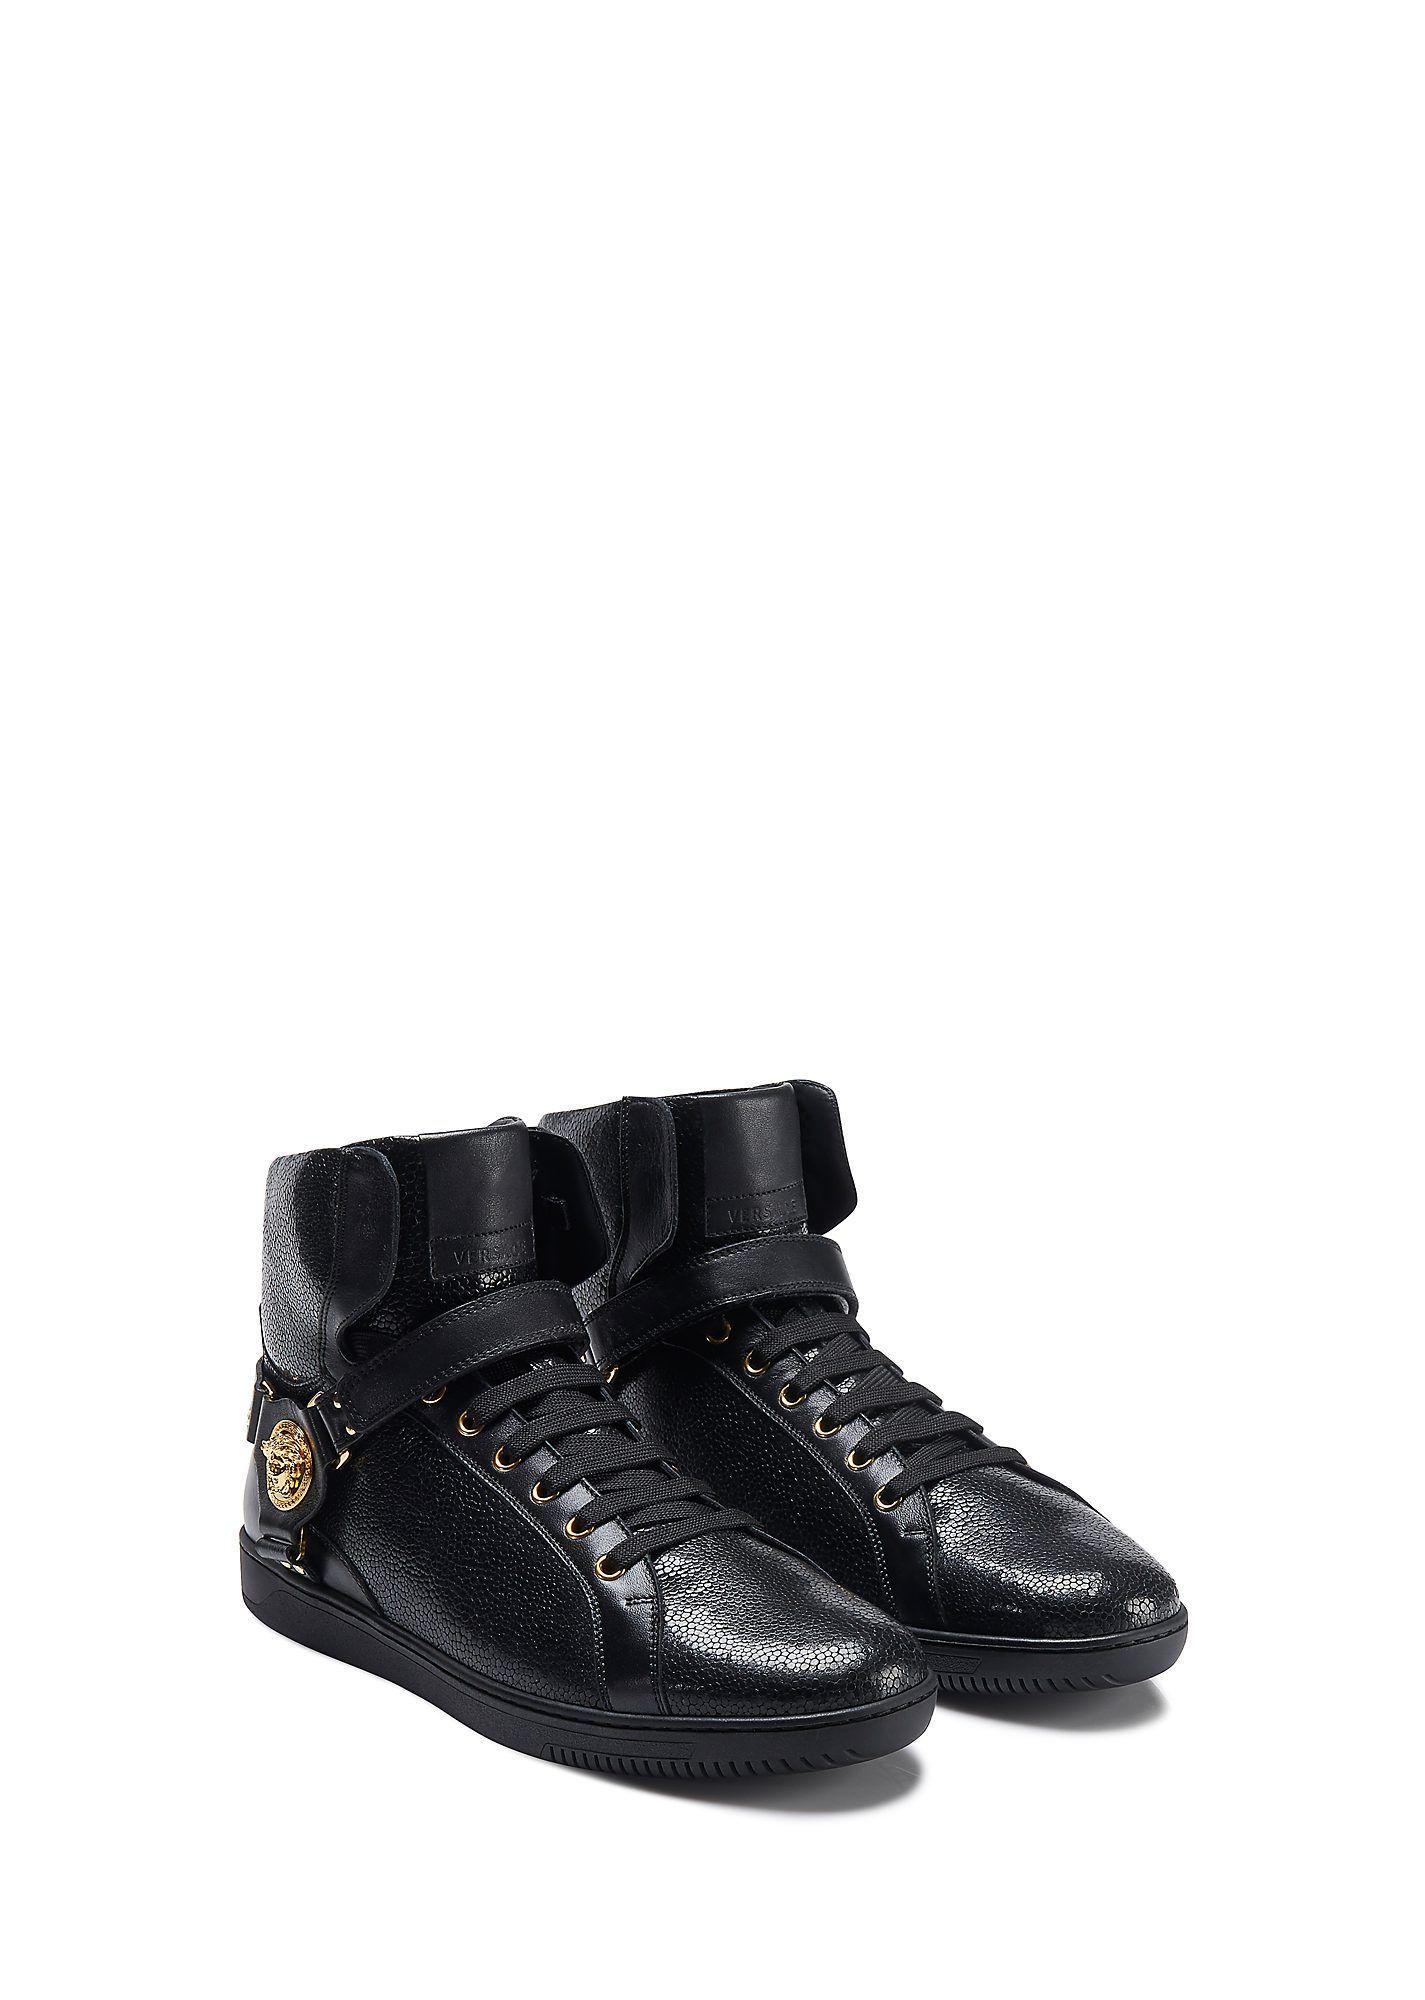 9fc201731669 VERSACE Sting Ray Printed Hi Top.  versace  shoes  sting ray printed ...